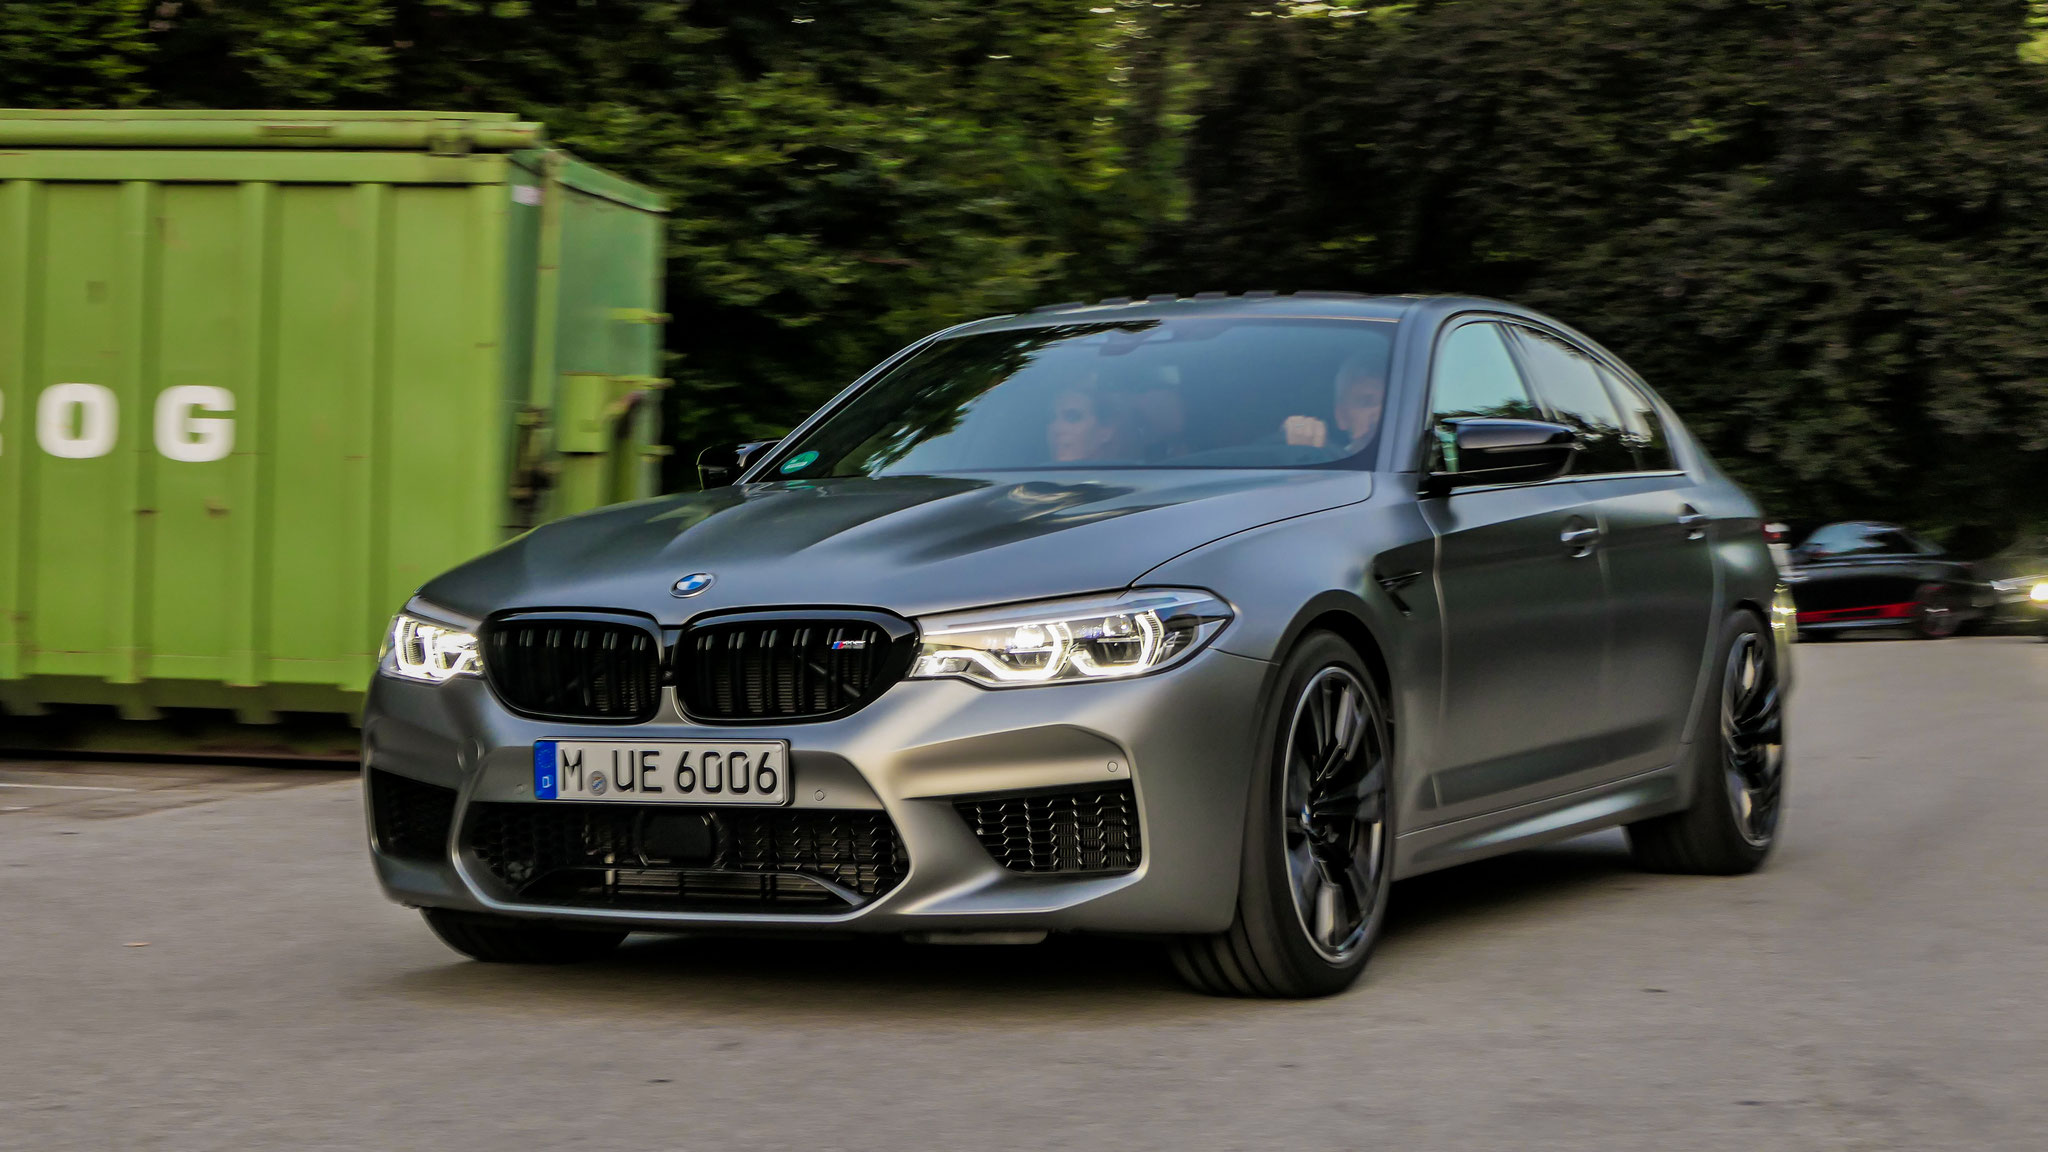 BMW M5 - M-UE-6006